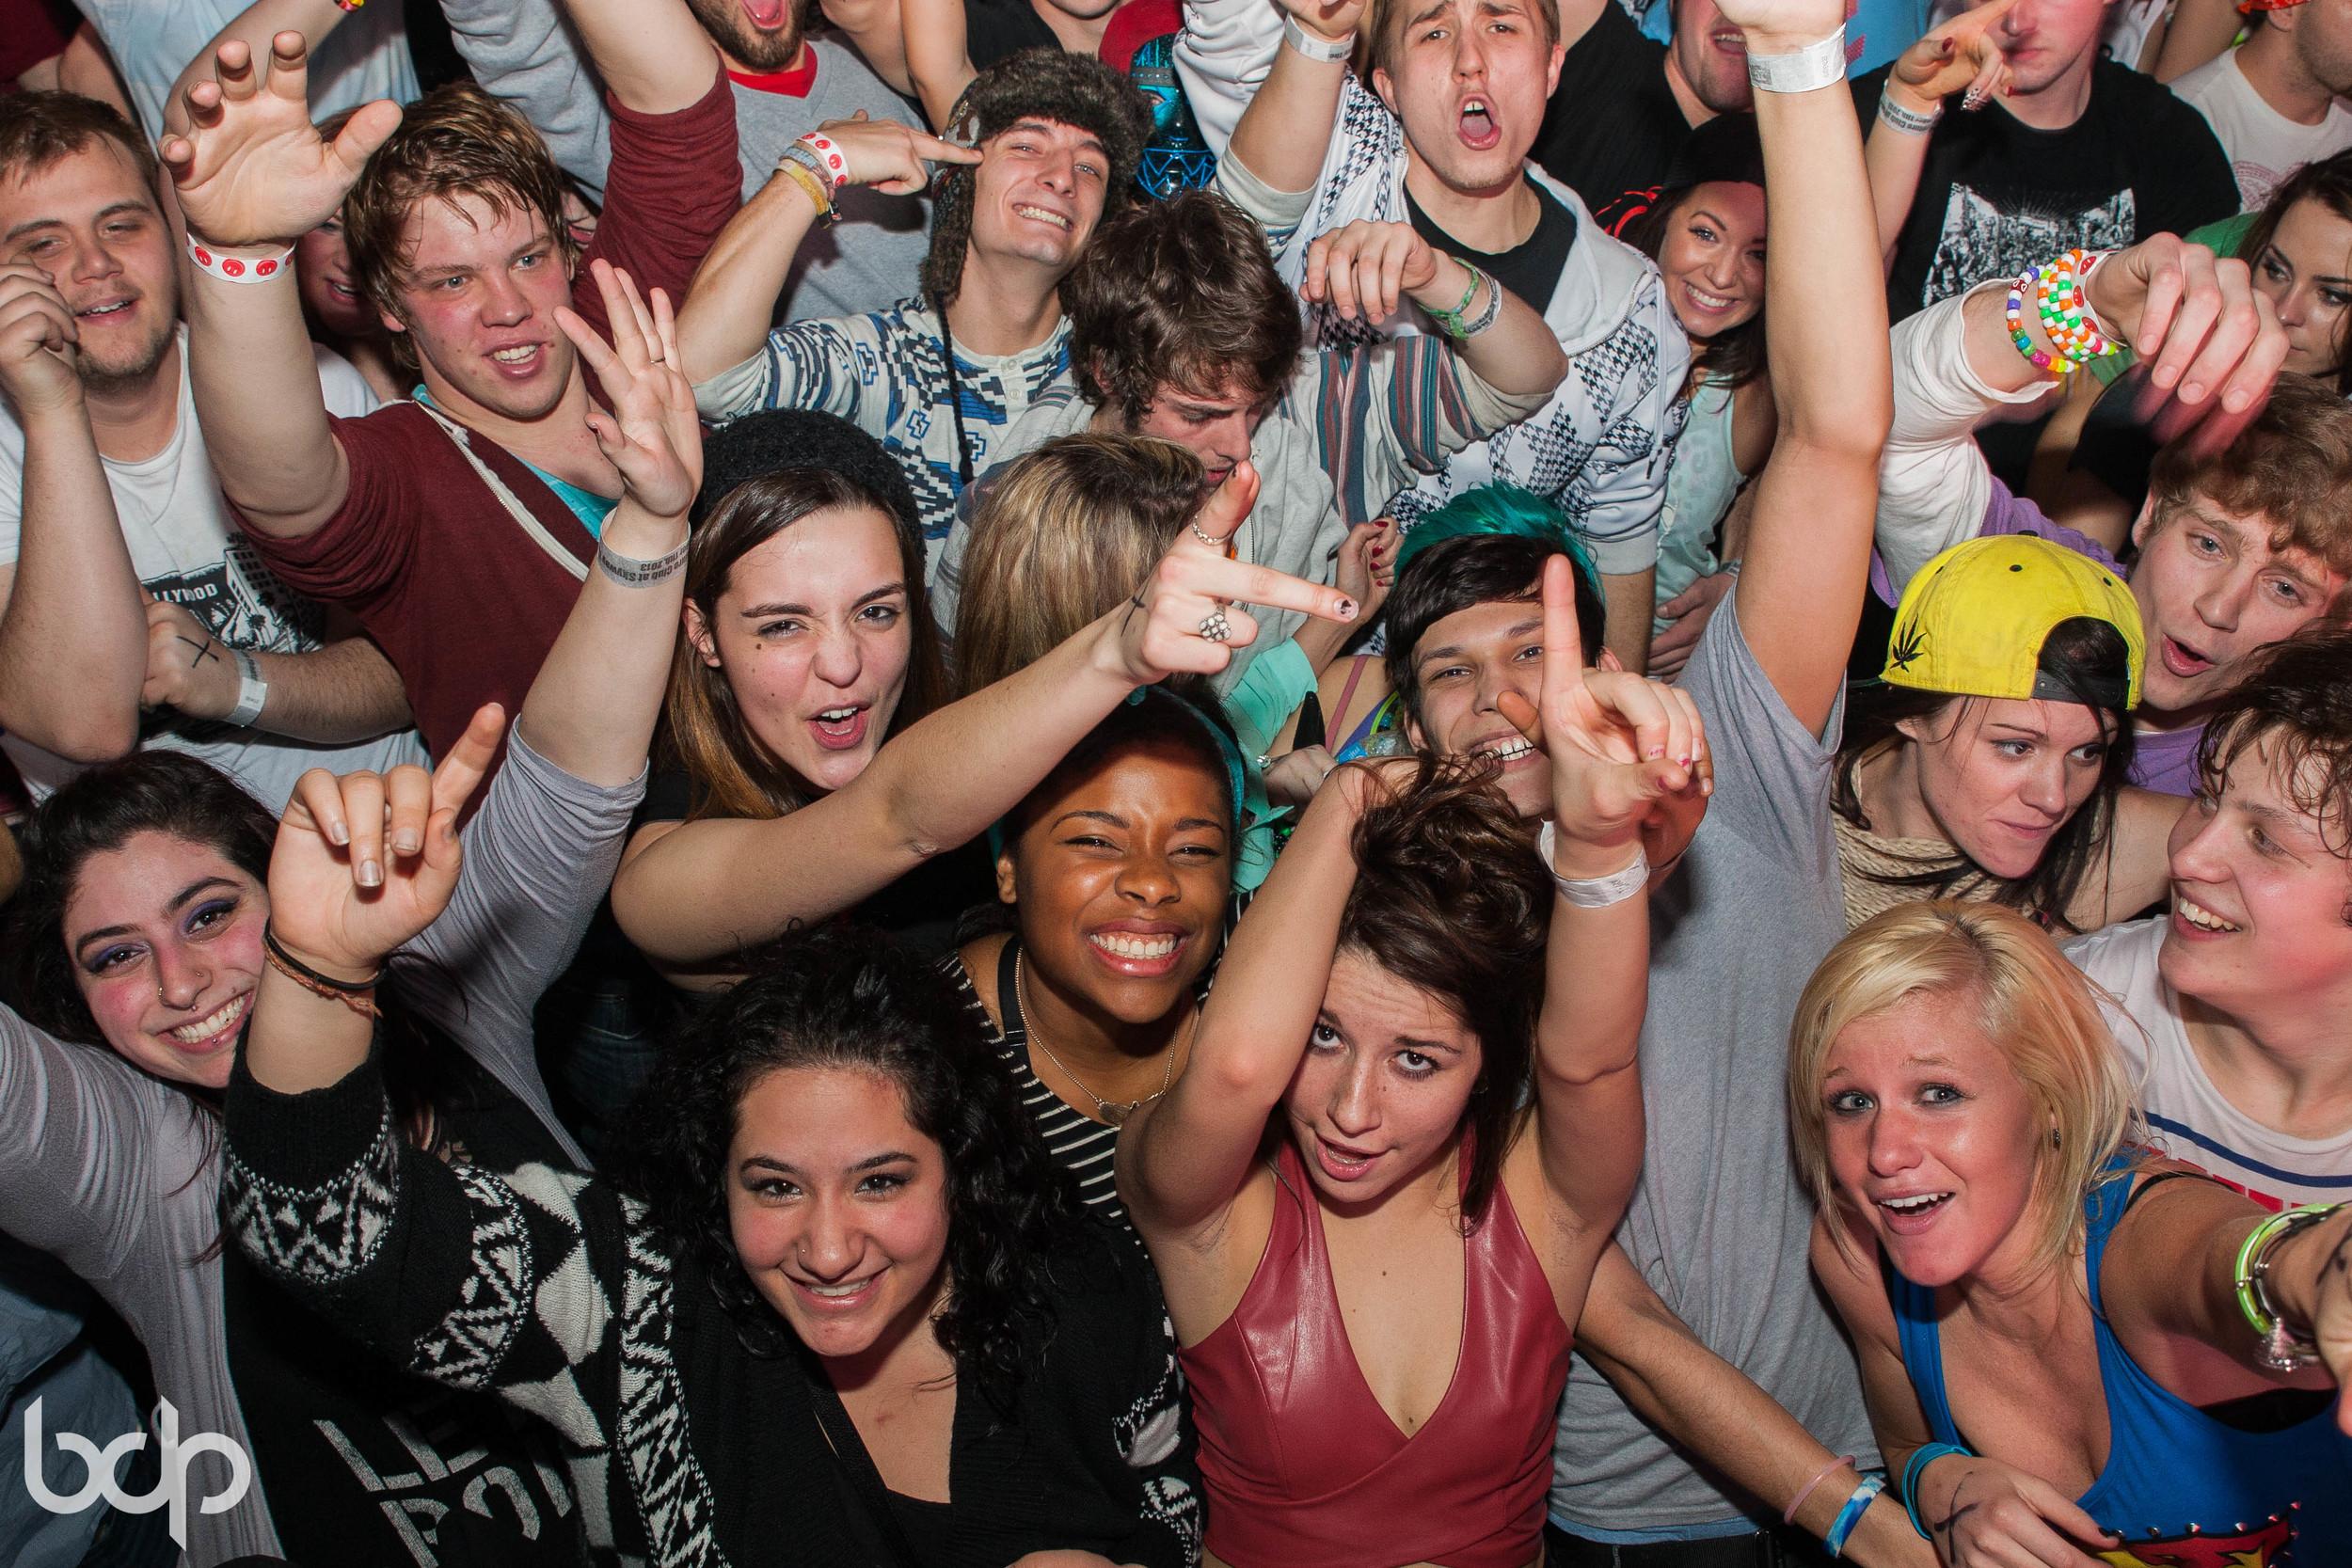 DallasK, DVBBS & Adventure Club at Skyway Theatre 121113 BDP-46.jpg